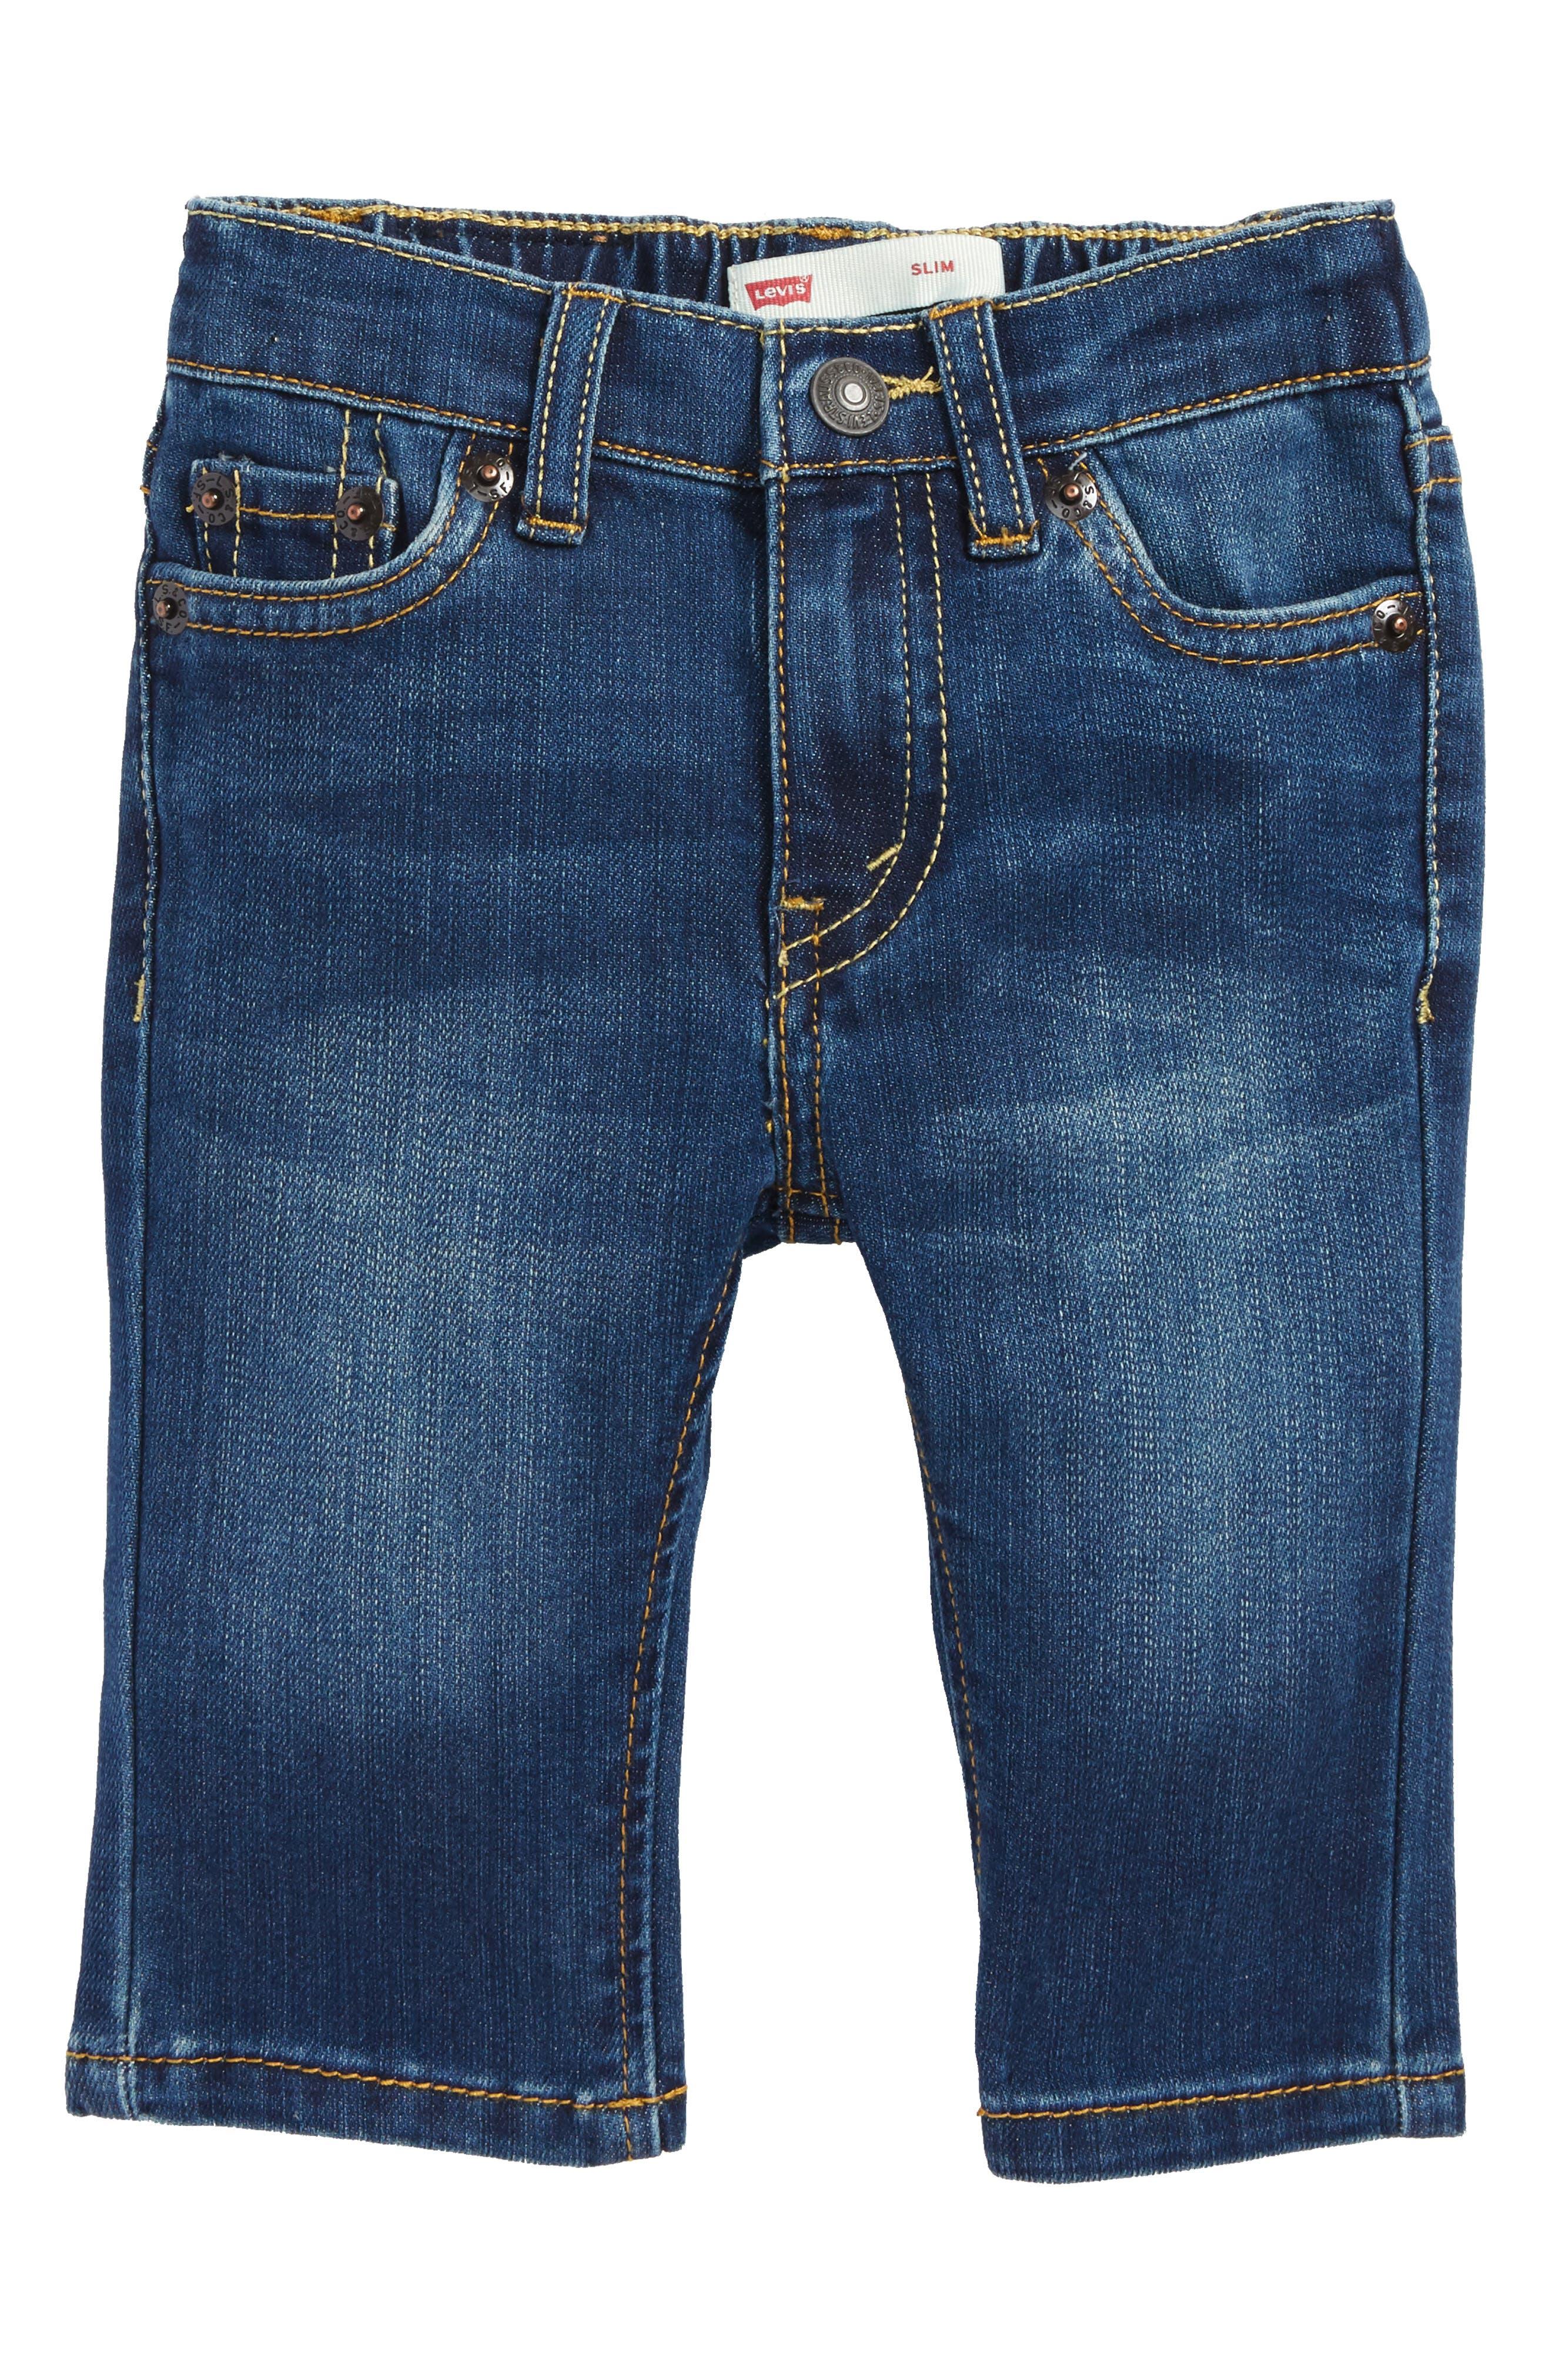 Alternate Image 1 Selected - Levi's® Comfort Slim Fit Jeans (Reflex Blue) (Baby Boys)